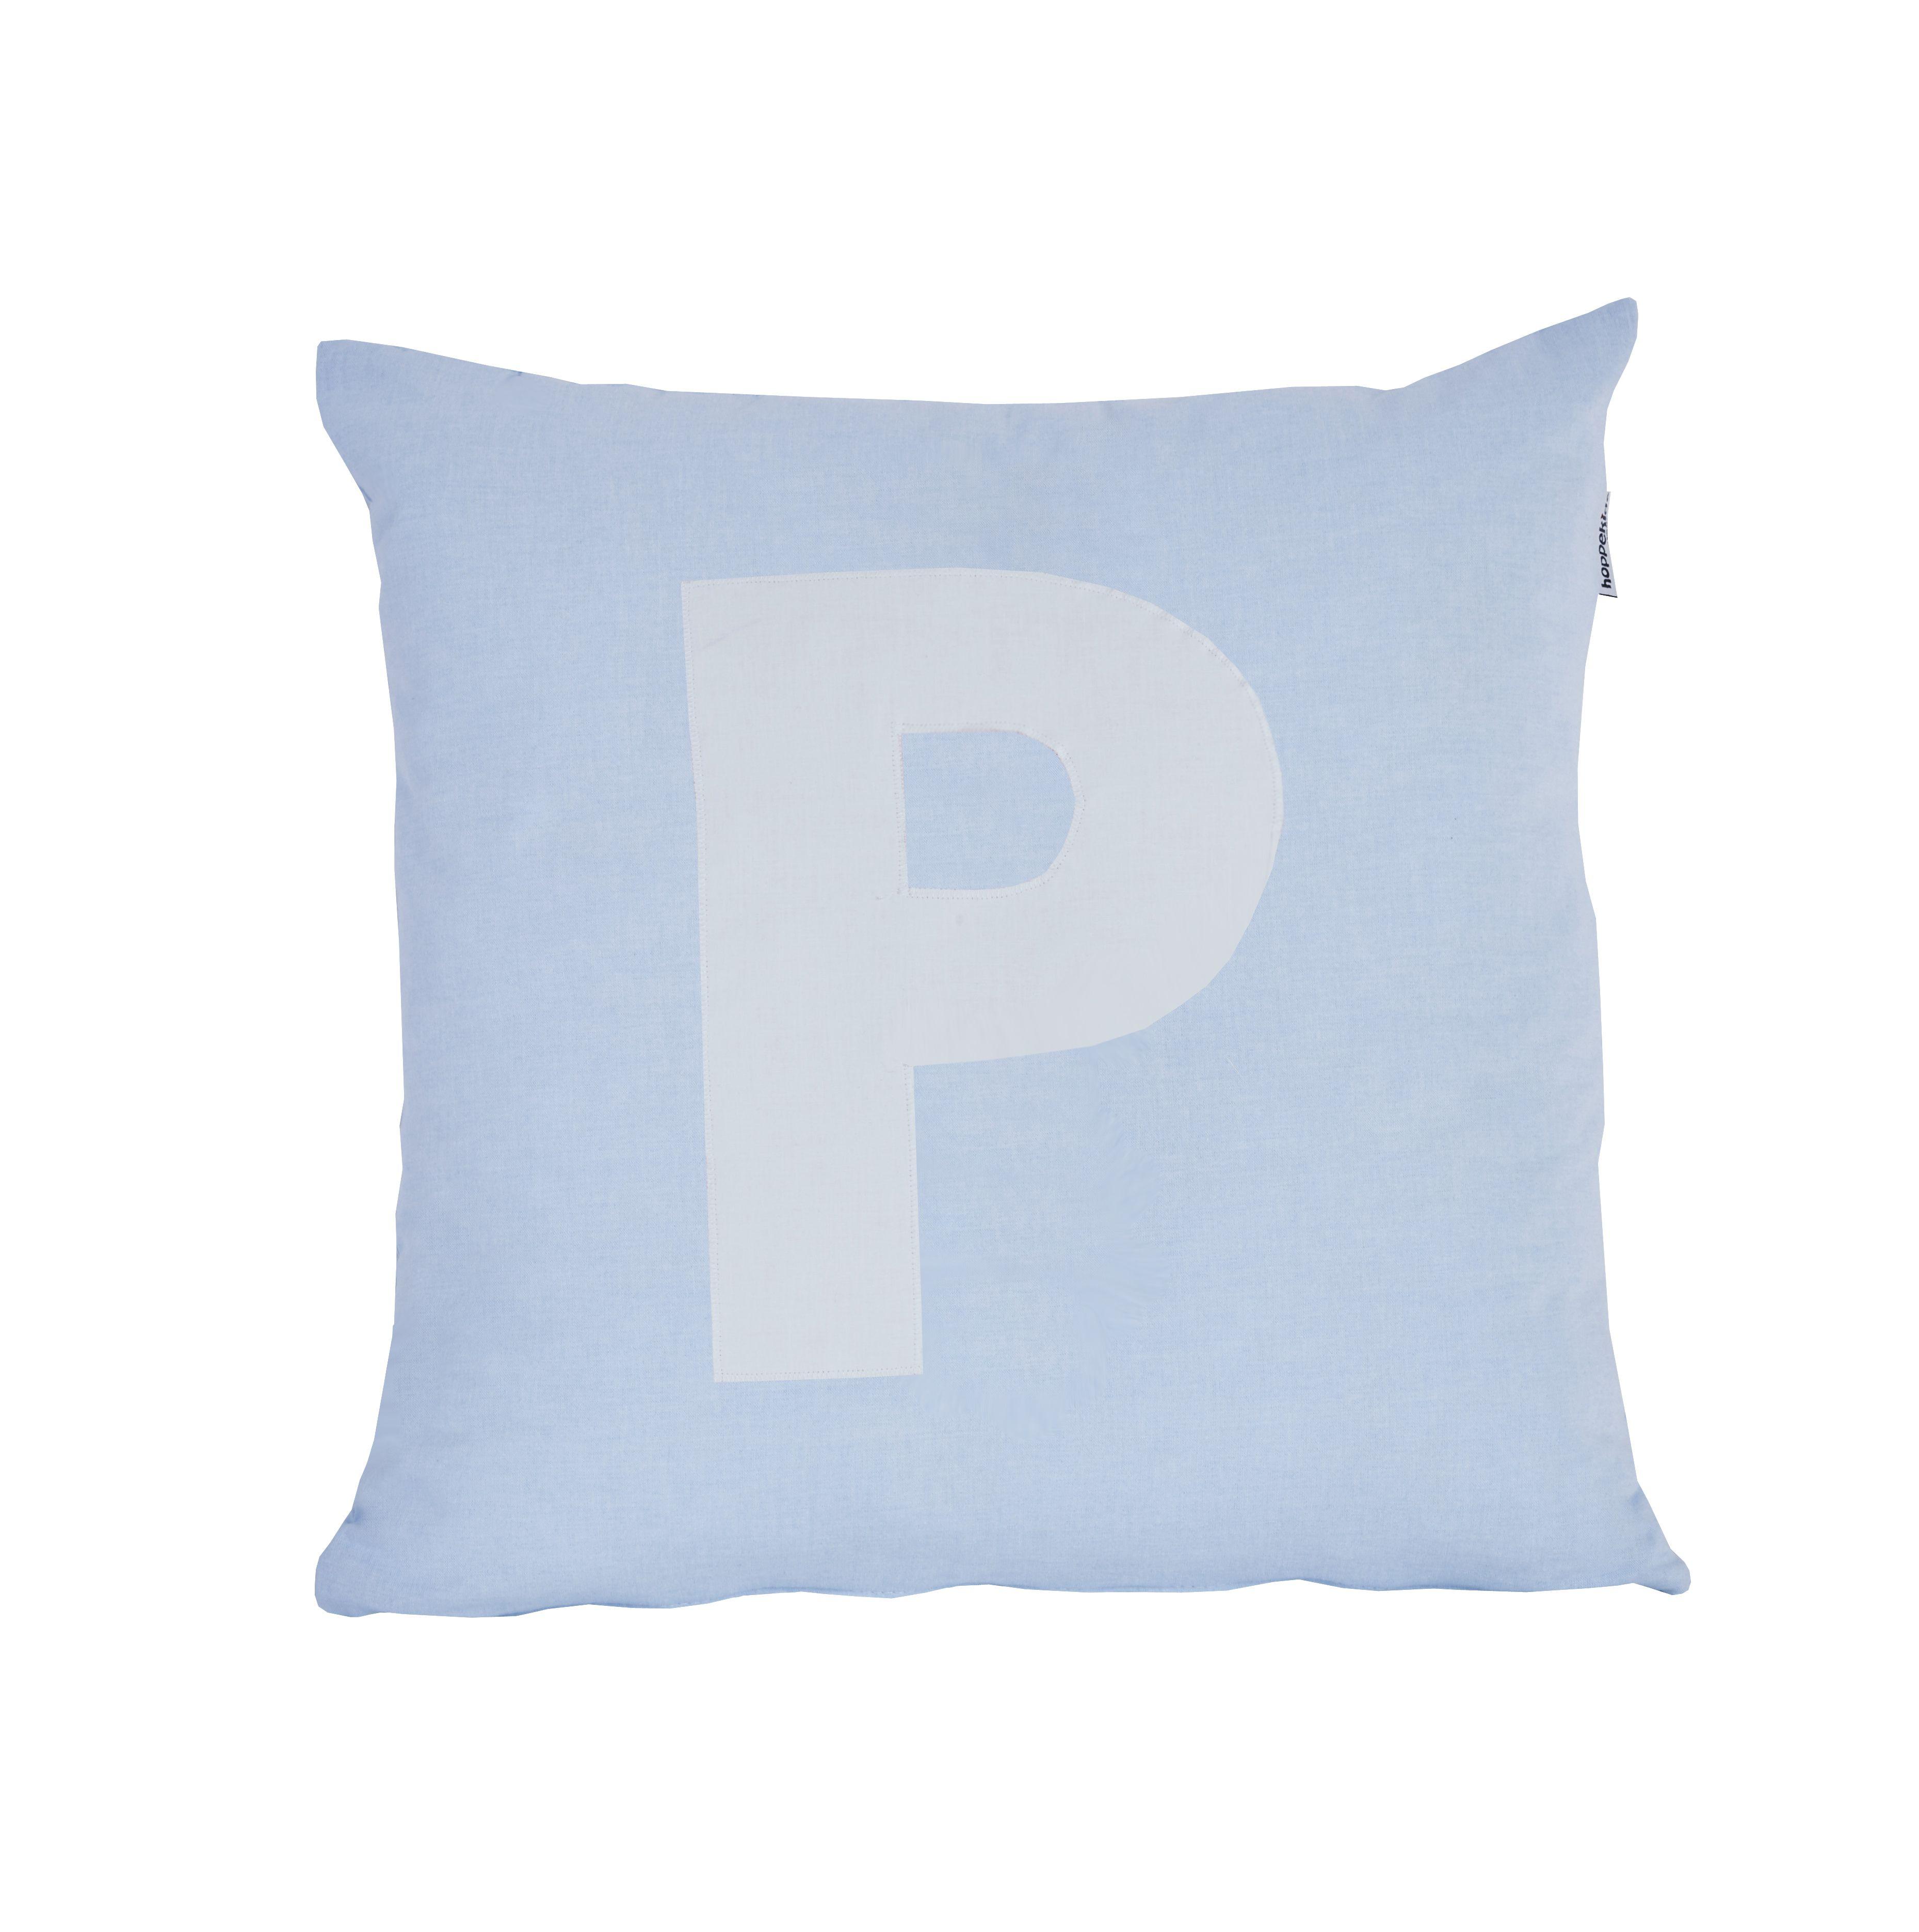 Pude Alphabet P lyseblå fra Hoppekids